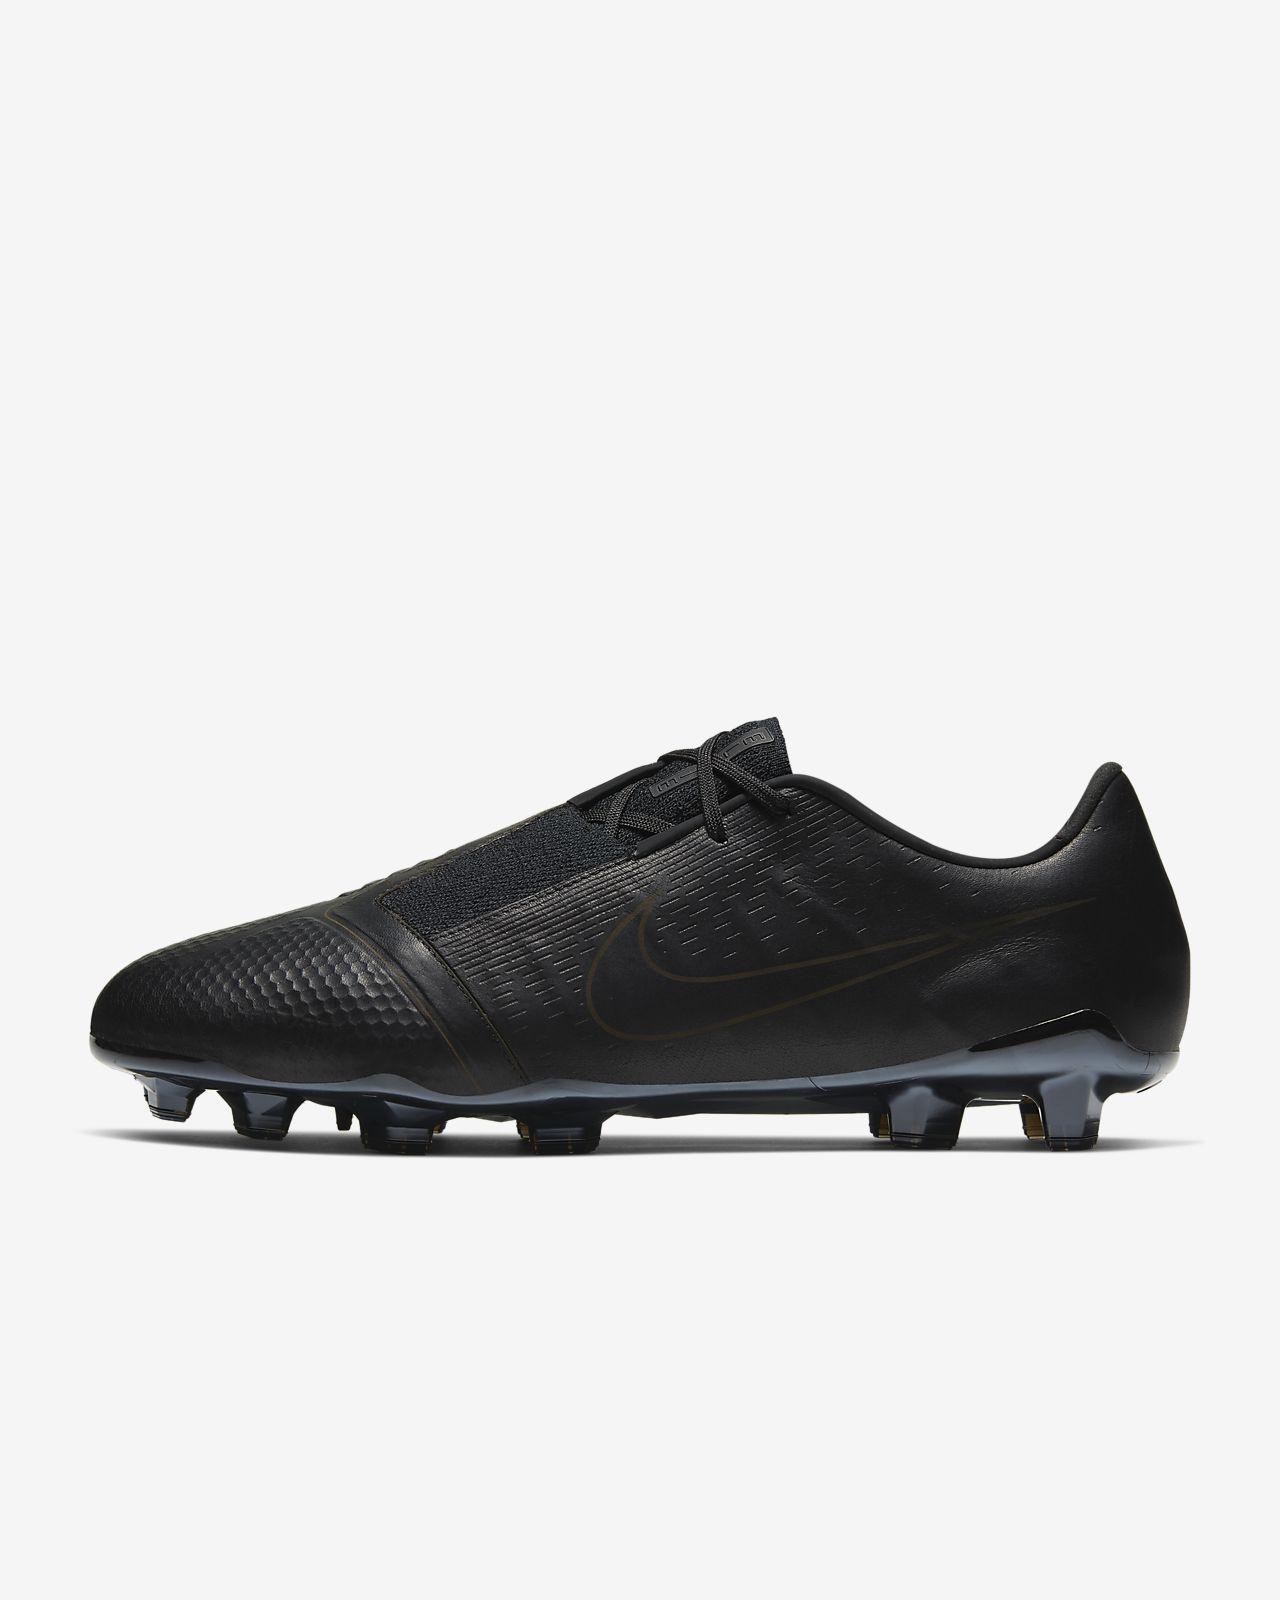 Chaussure de football à crampons pour terrain sec Nike PhantomVNM Elite Tech Craft FG